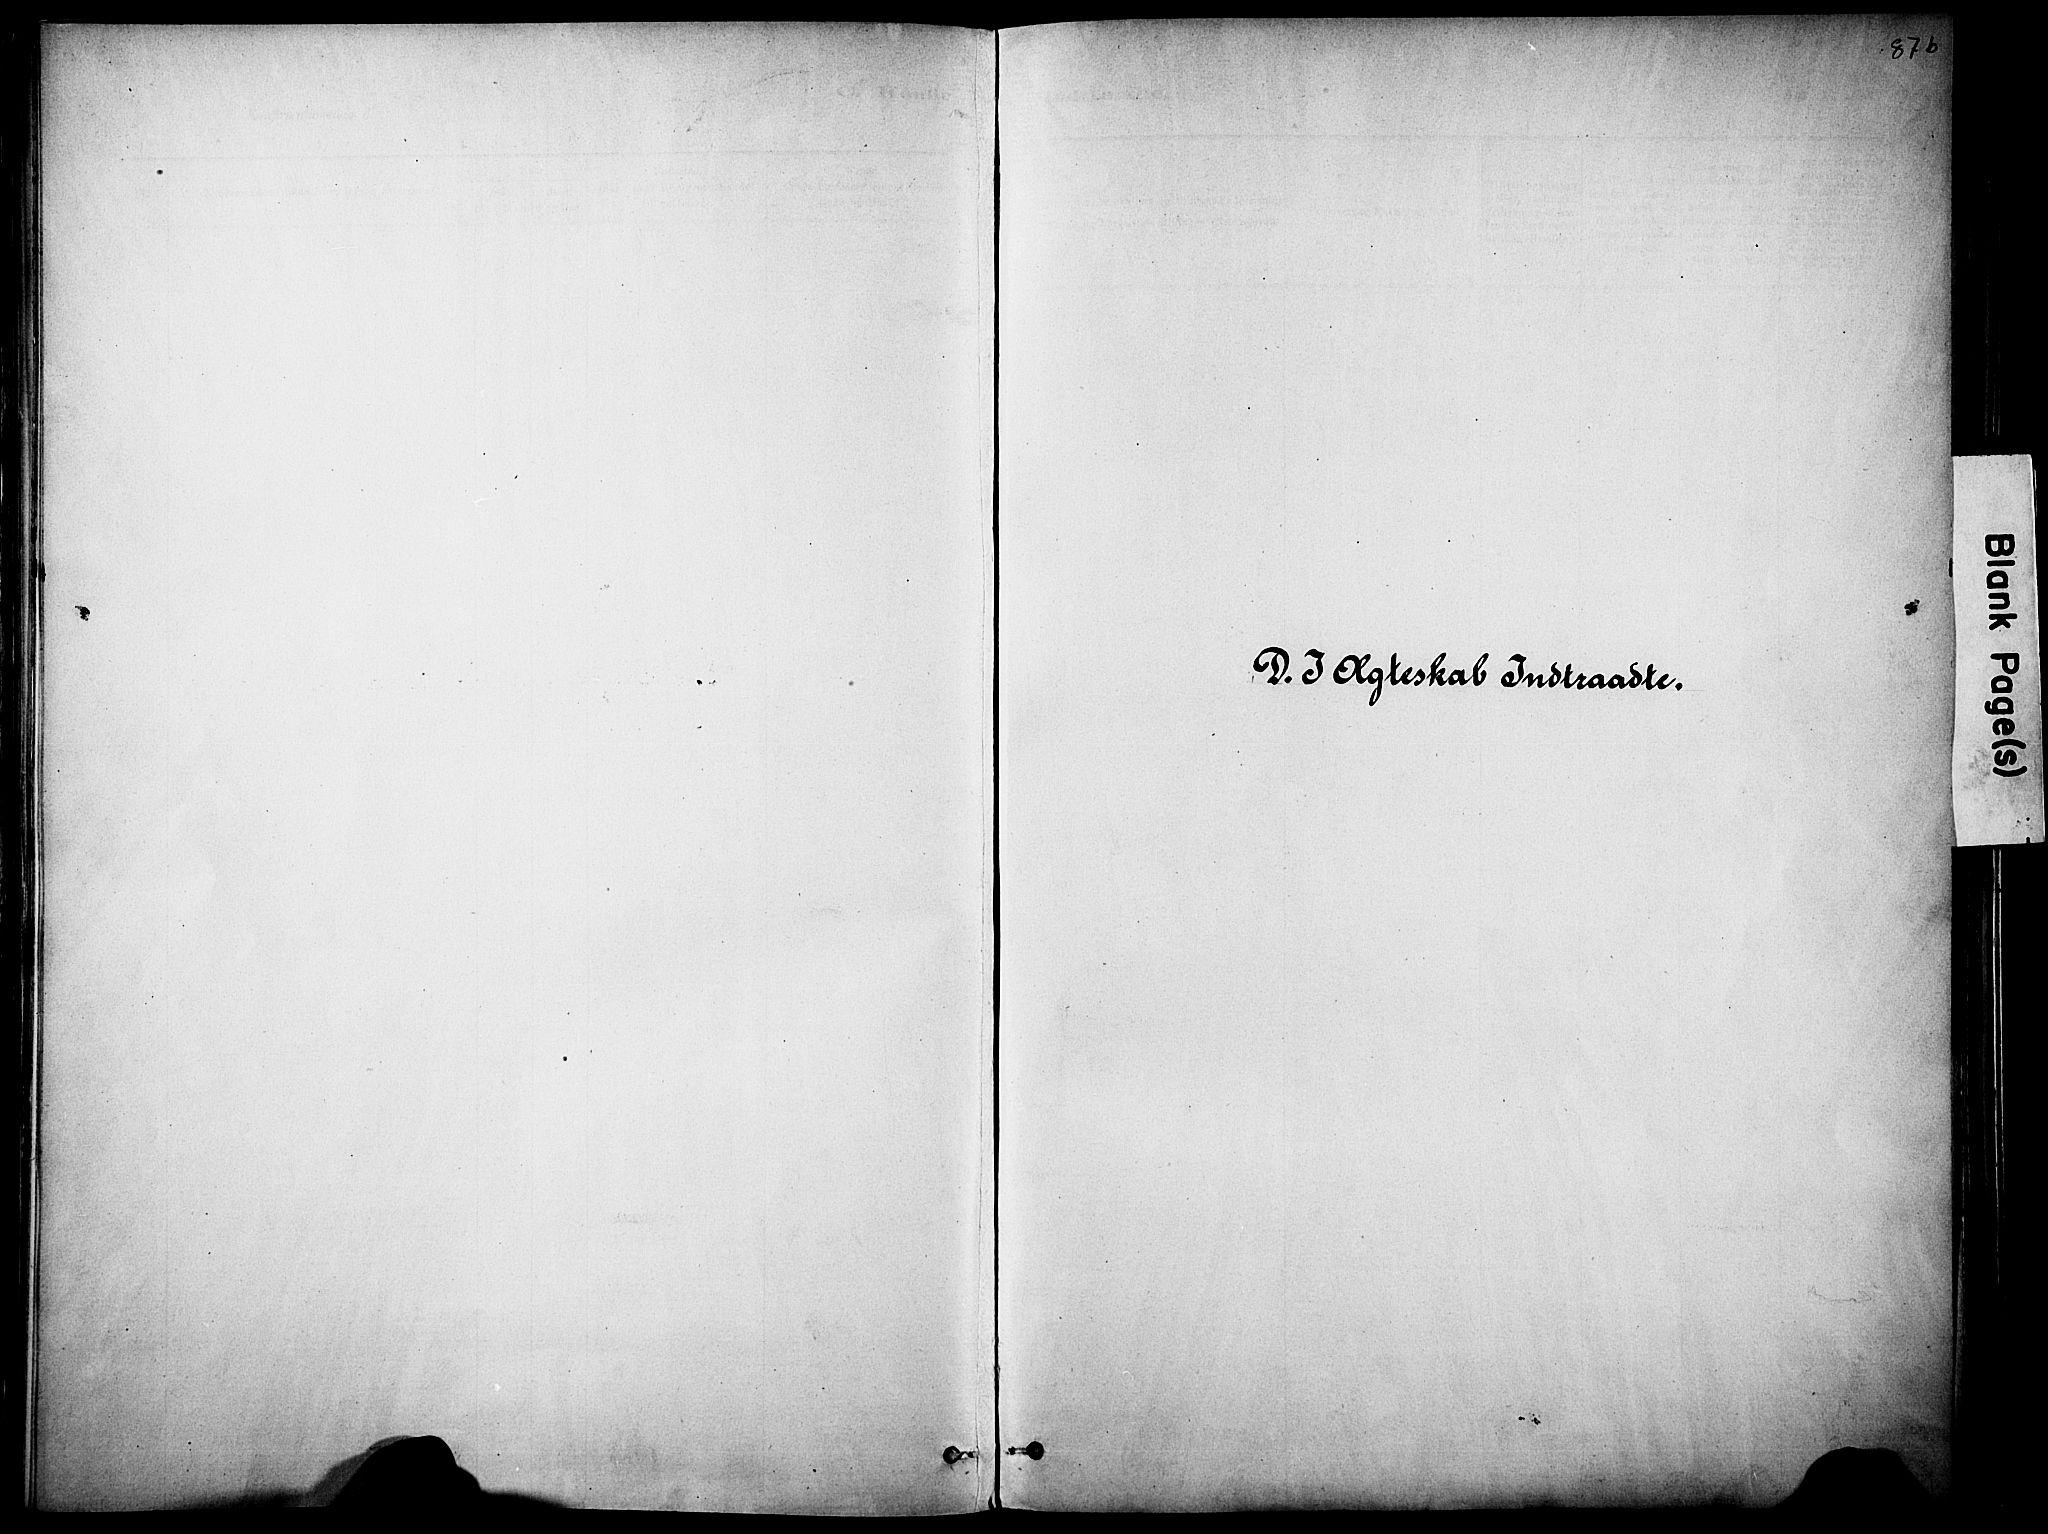 SAH, Vågå prestekontor, Ministerialbok nr. 10, 1887-1904, s. 87